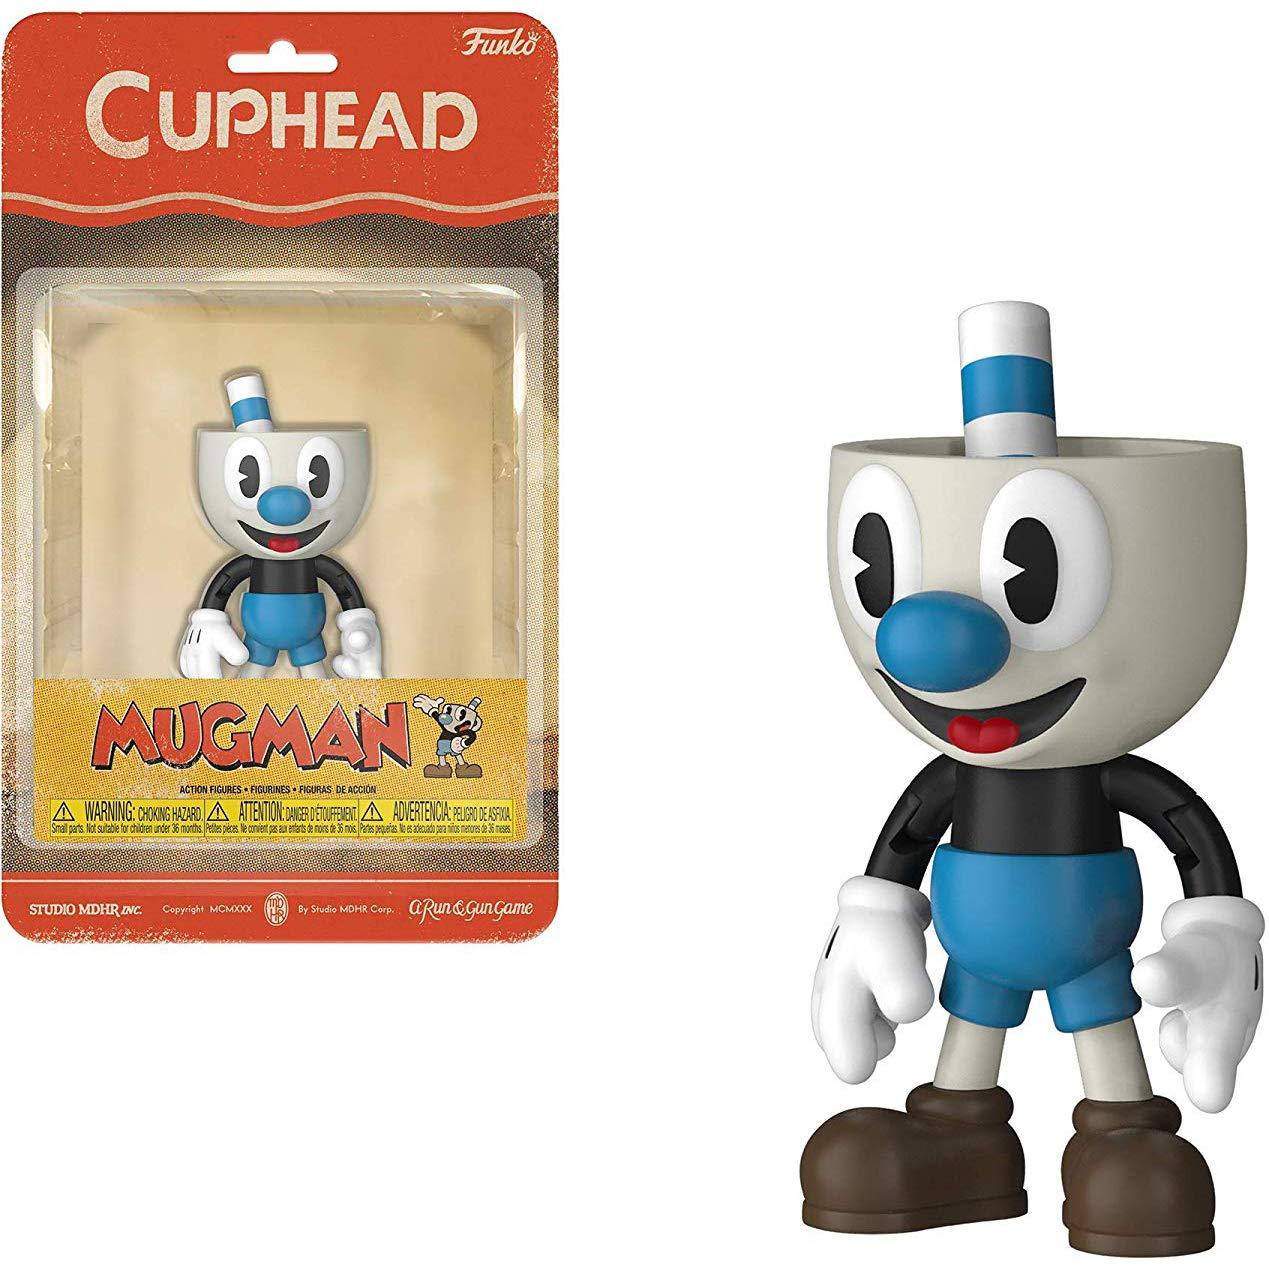 Amazon com: Mugman: Funko Cuphead x Mini Action Figure + 1 Video